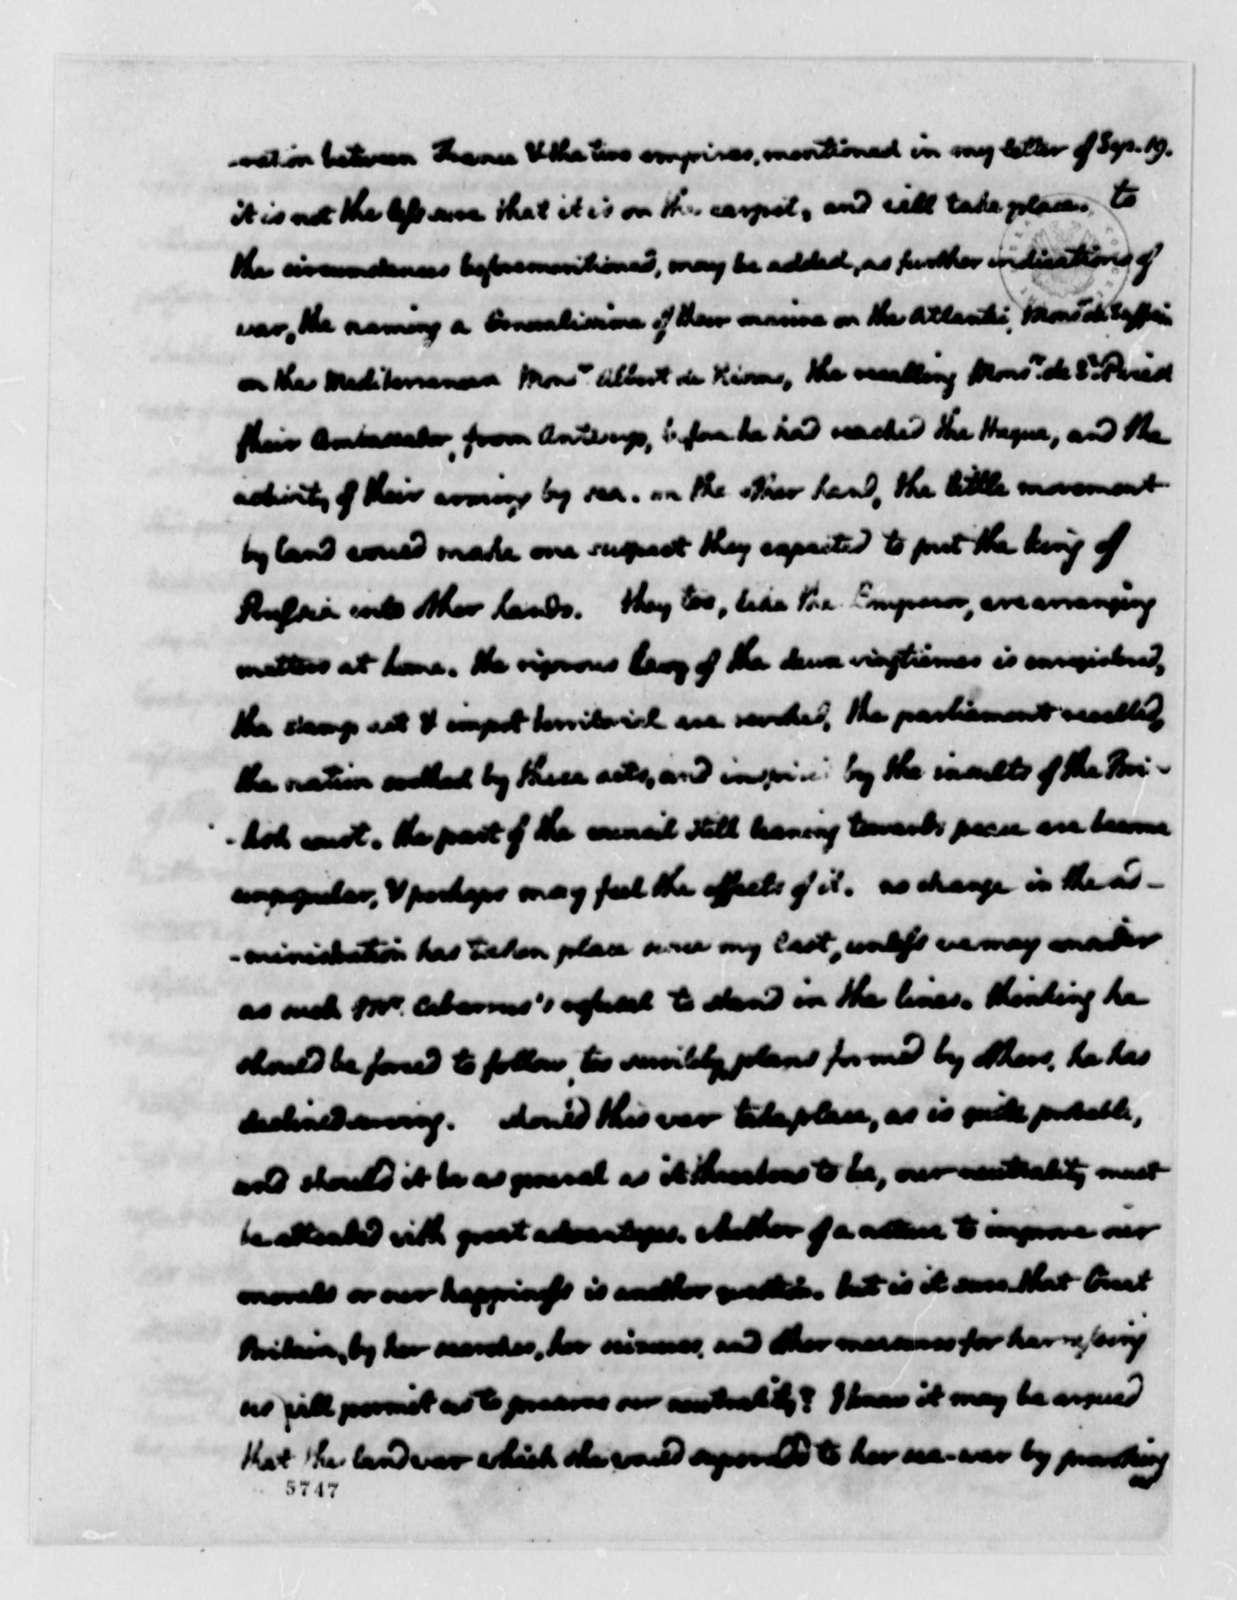 Thomas Jefferson to John Jay, October 8, 1787, two same date